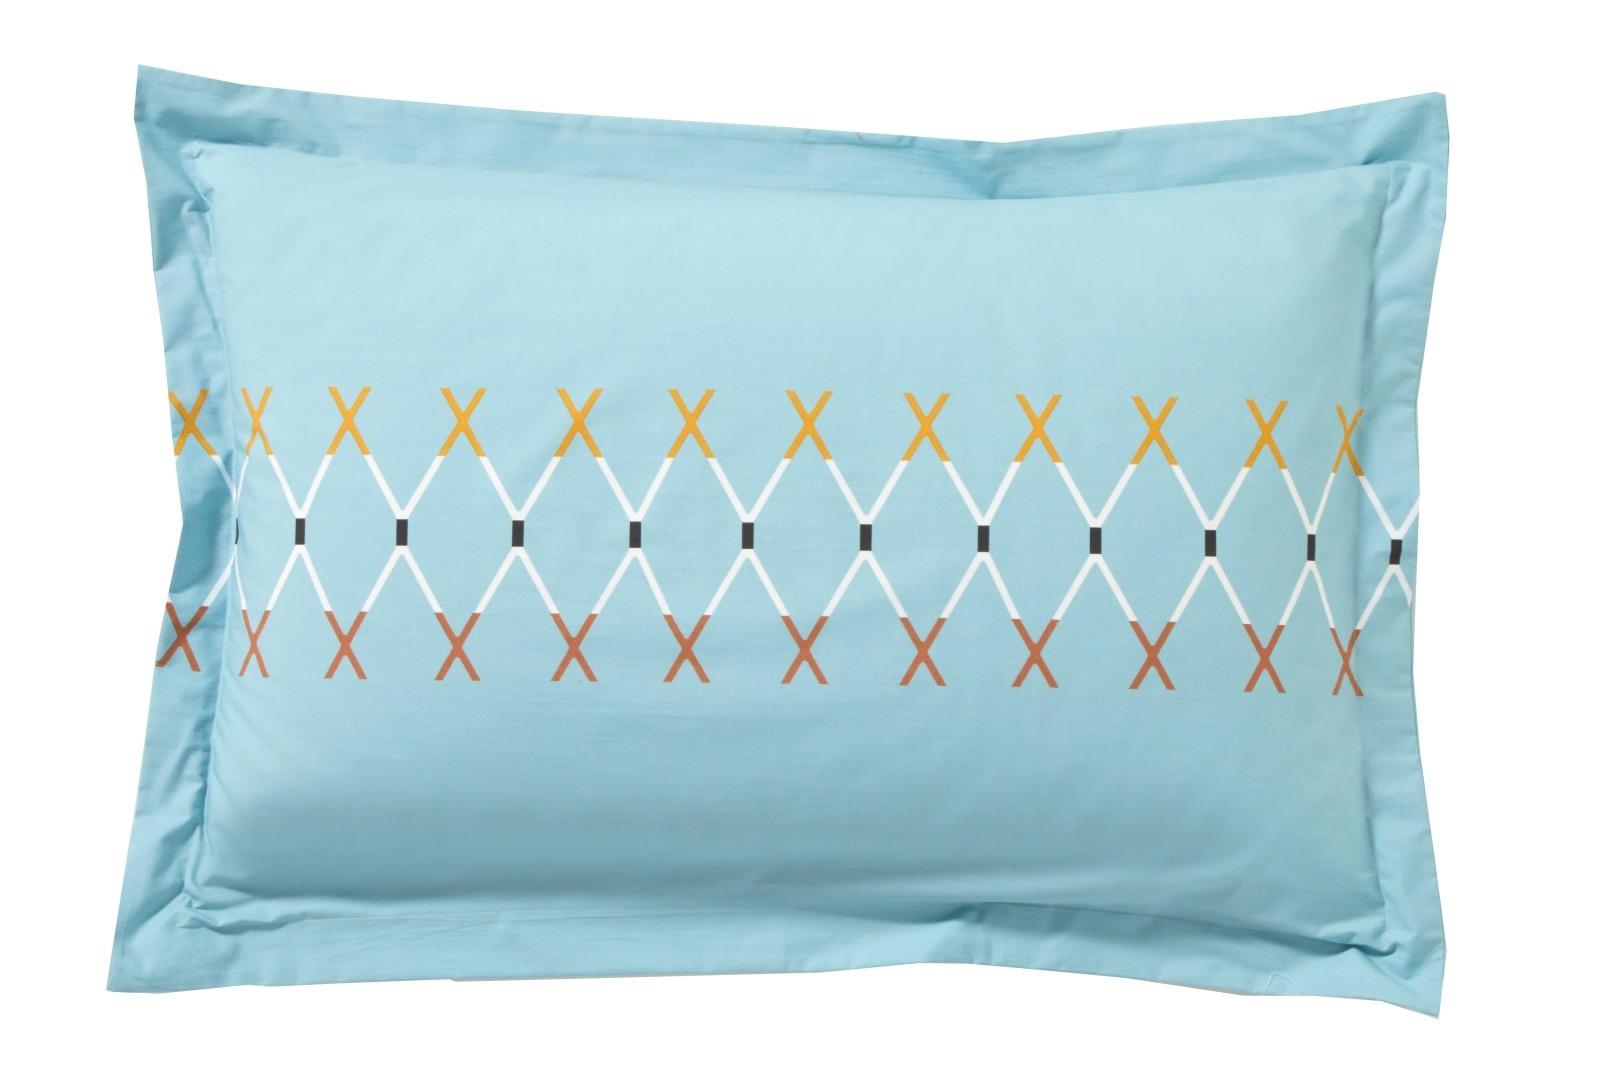 poszewki perkalowe blanc des vosges vespa celadon poszewki. Black Bedroom Furniture Sets. Home Design Ideas